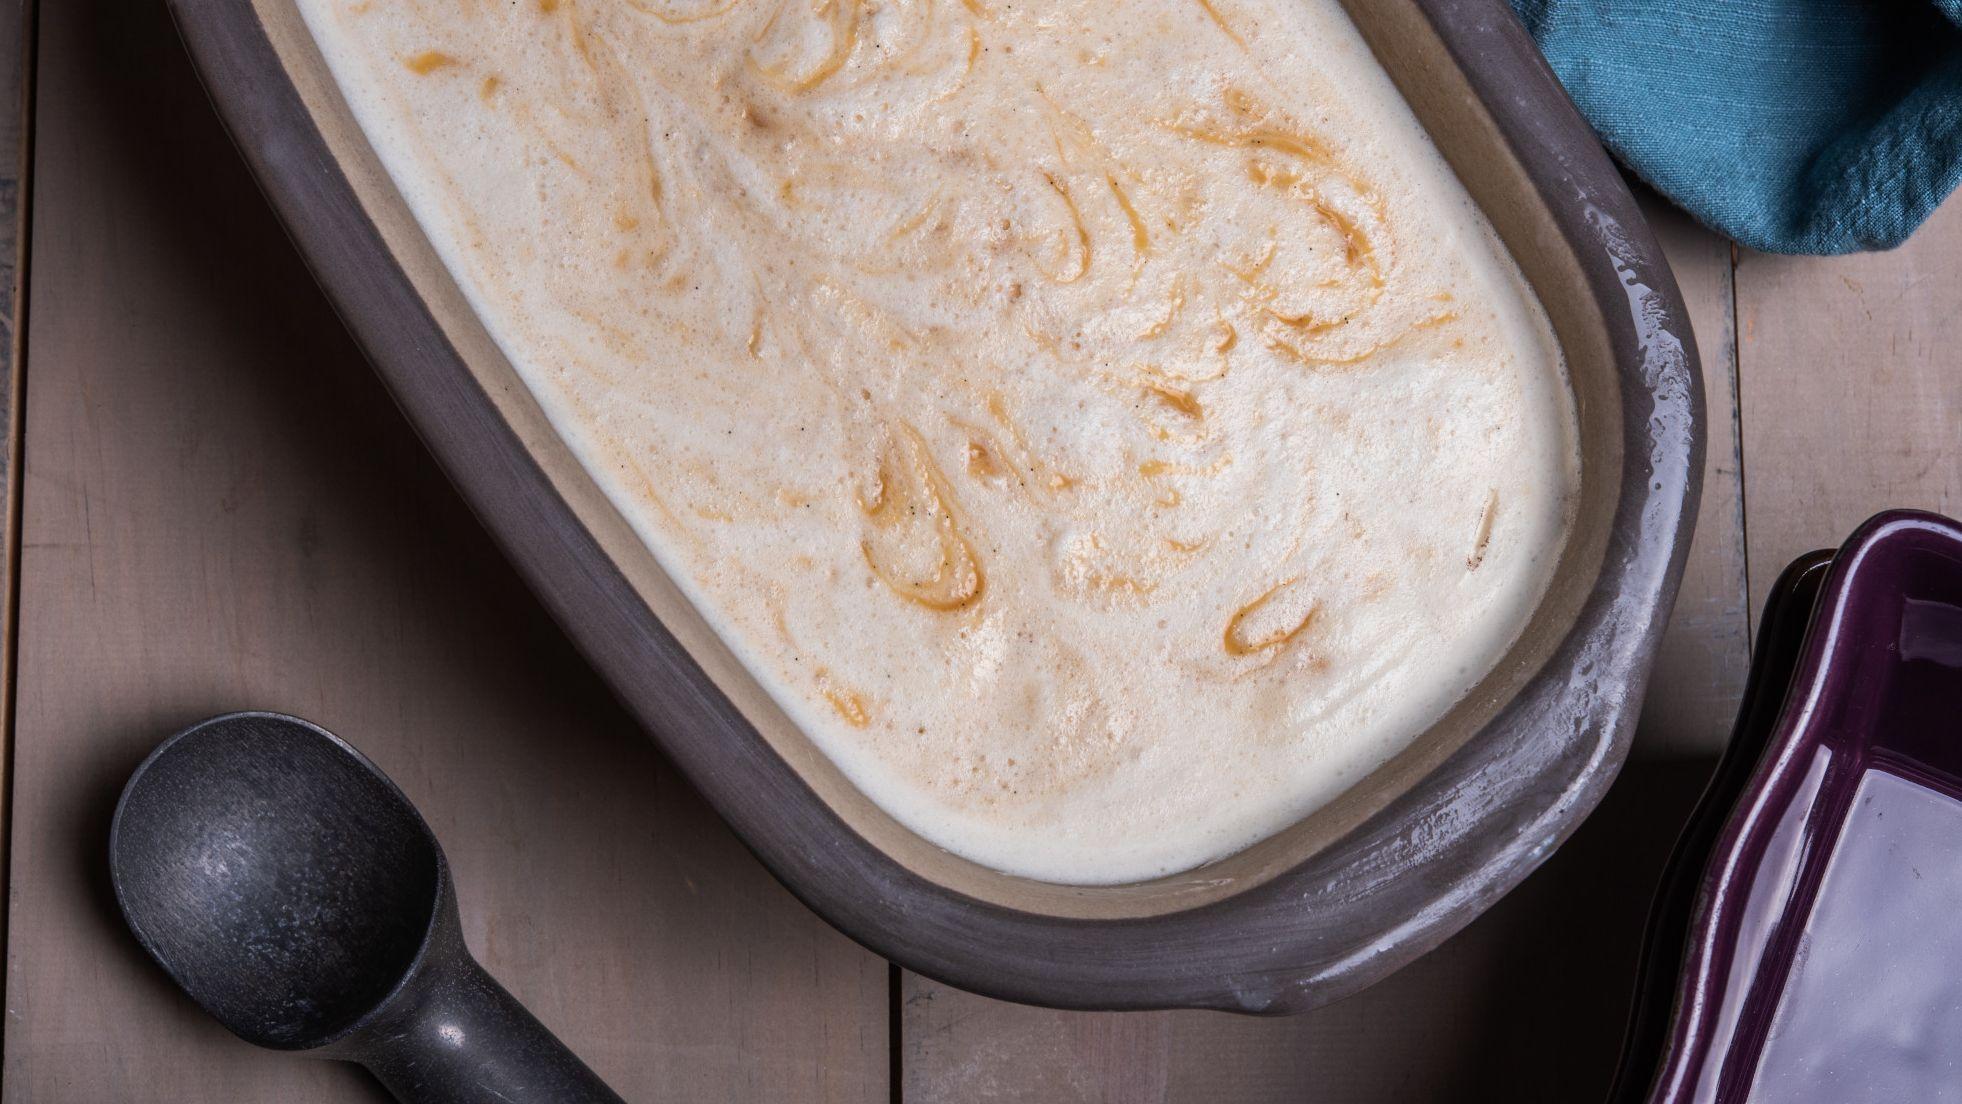 caramel_swirl_ice_cream11737.jpg